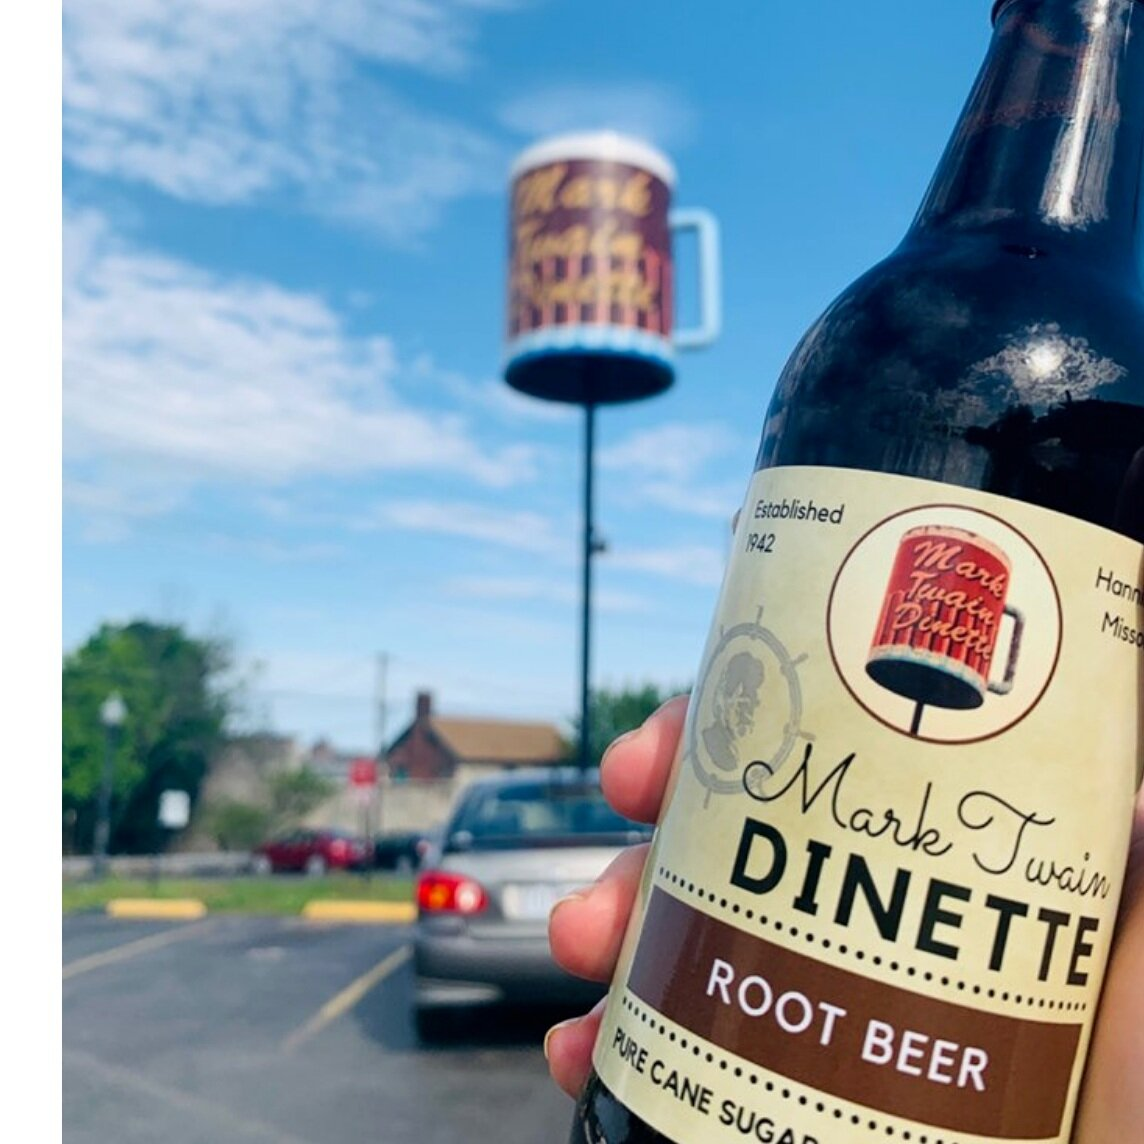 Mark Twain Dinette Homemade Root Beer - 4-Pack of Bottles: 7.50Case of 24 Bottles: 35.00Gallon: 5.951/2 Gallon: 4.49Contact us for Keg Pricing. kennabogue@marktwaindinette.com